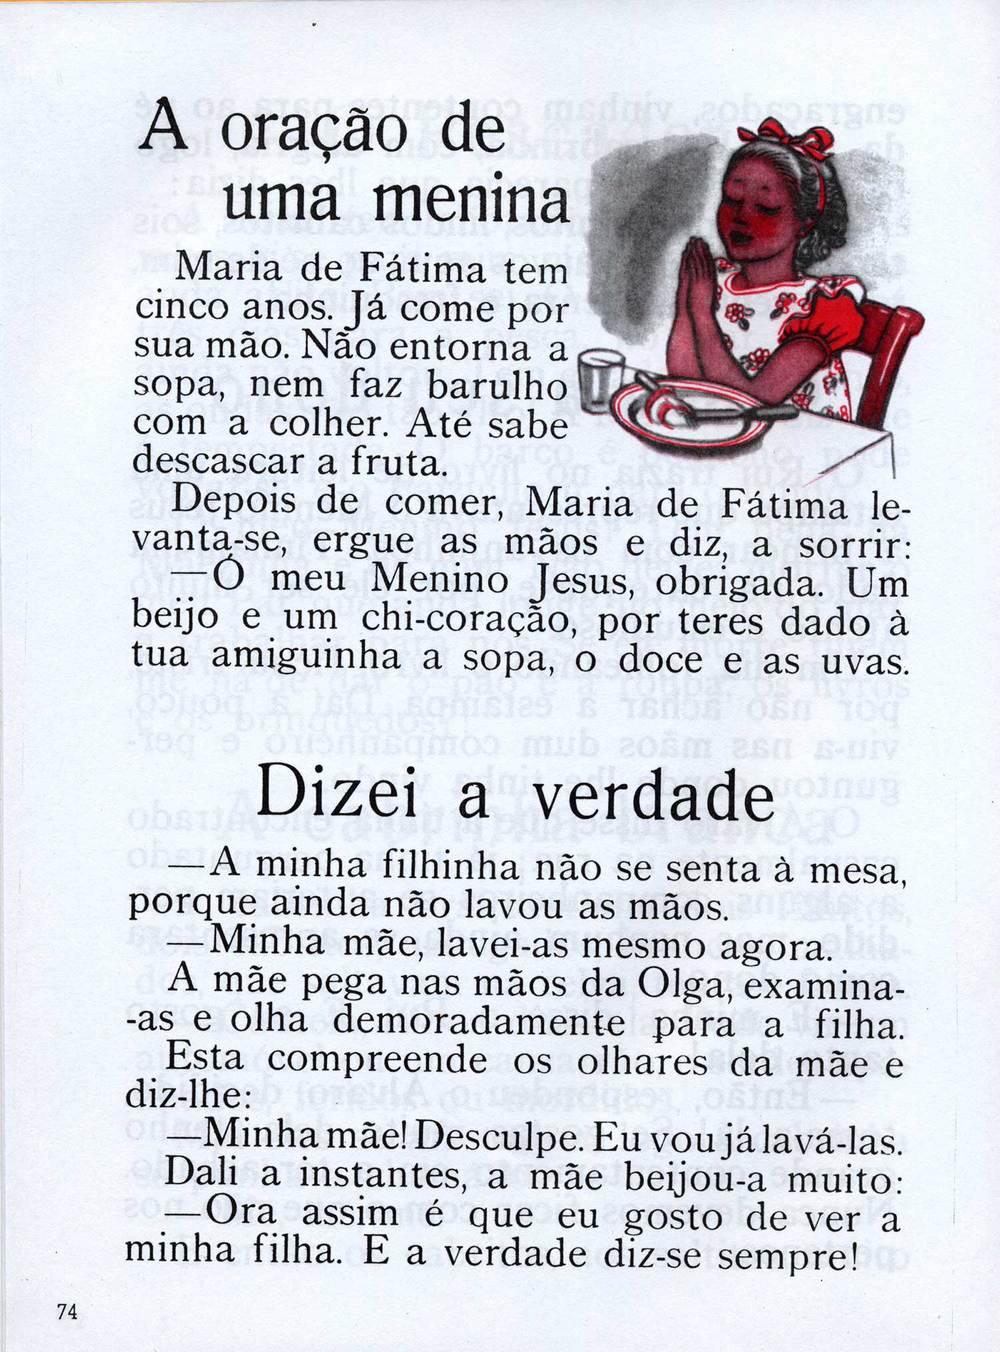 pt_textbk1_074_OLivroDaPrimeiraClasse_1954.jpg